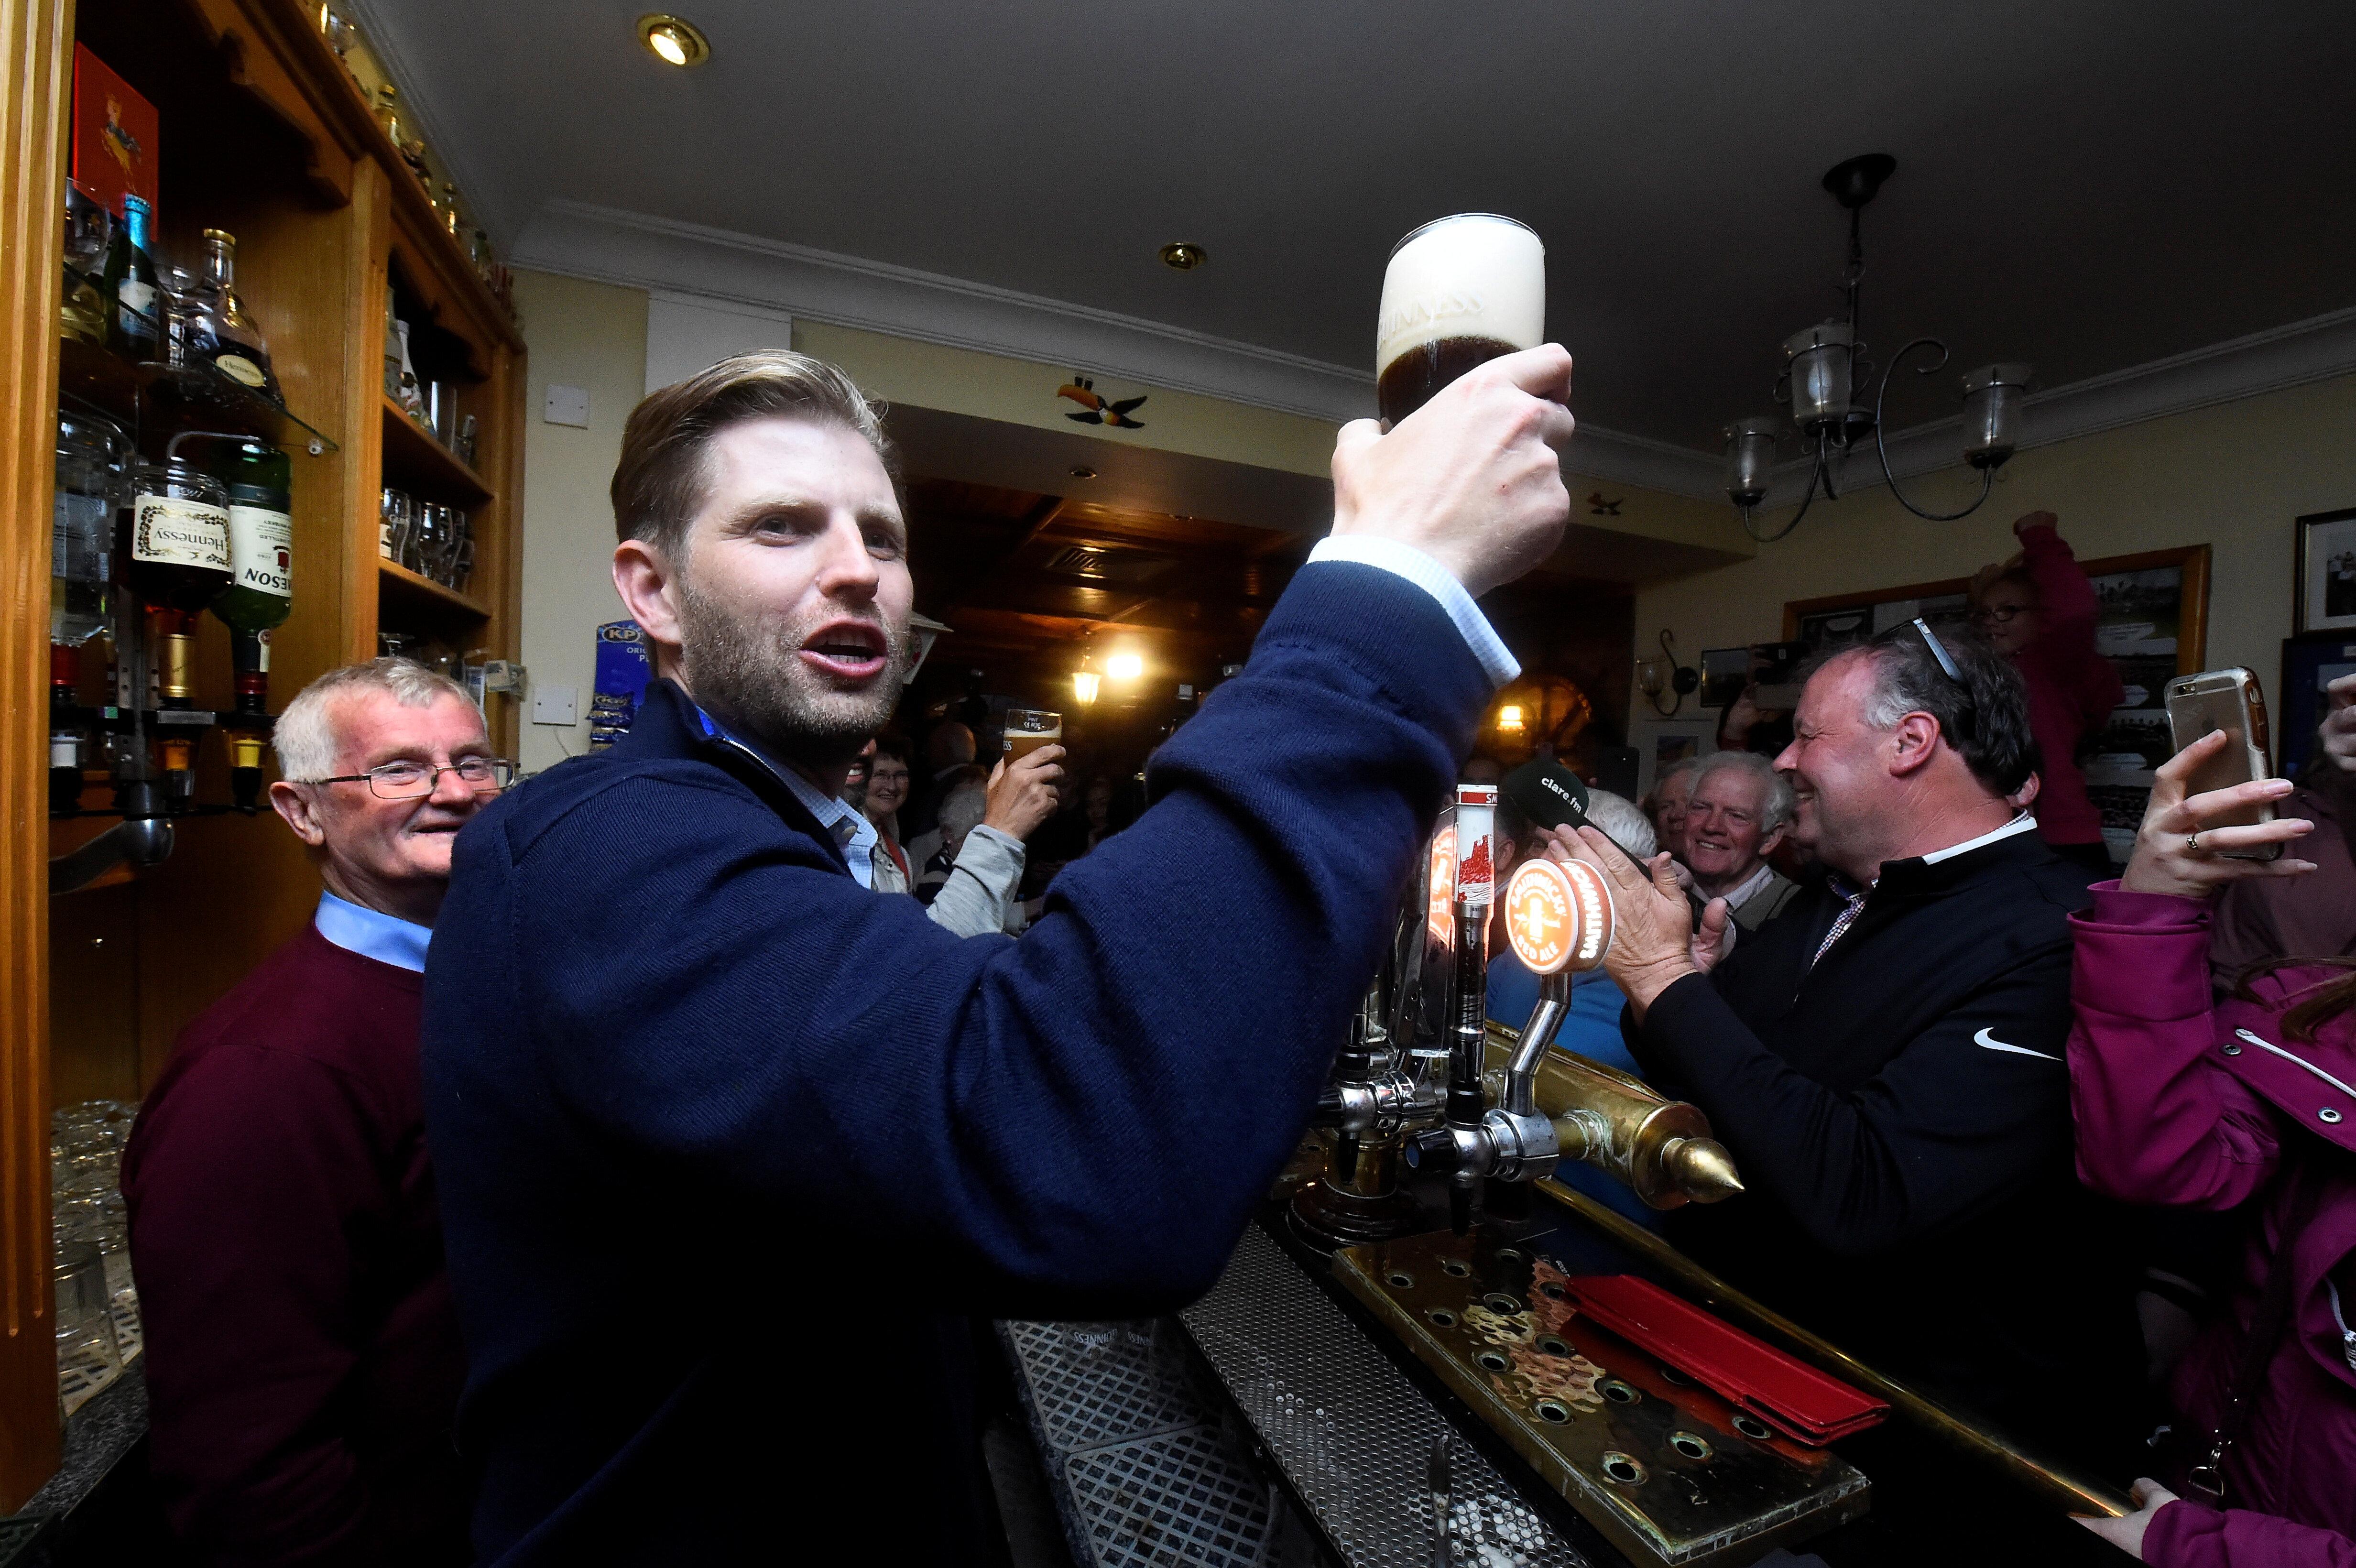 U.S. President Donald Trump's sons Eric and Donald Trump Jr. visit a local pub in Doonbeg village, Ireland June 5, 2019. REUTERS/Clodagh Kilcoyne